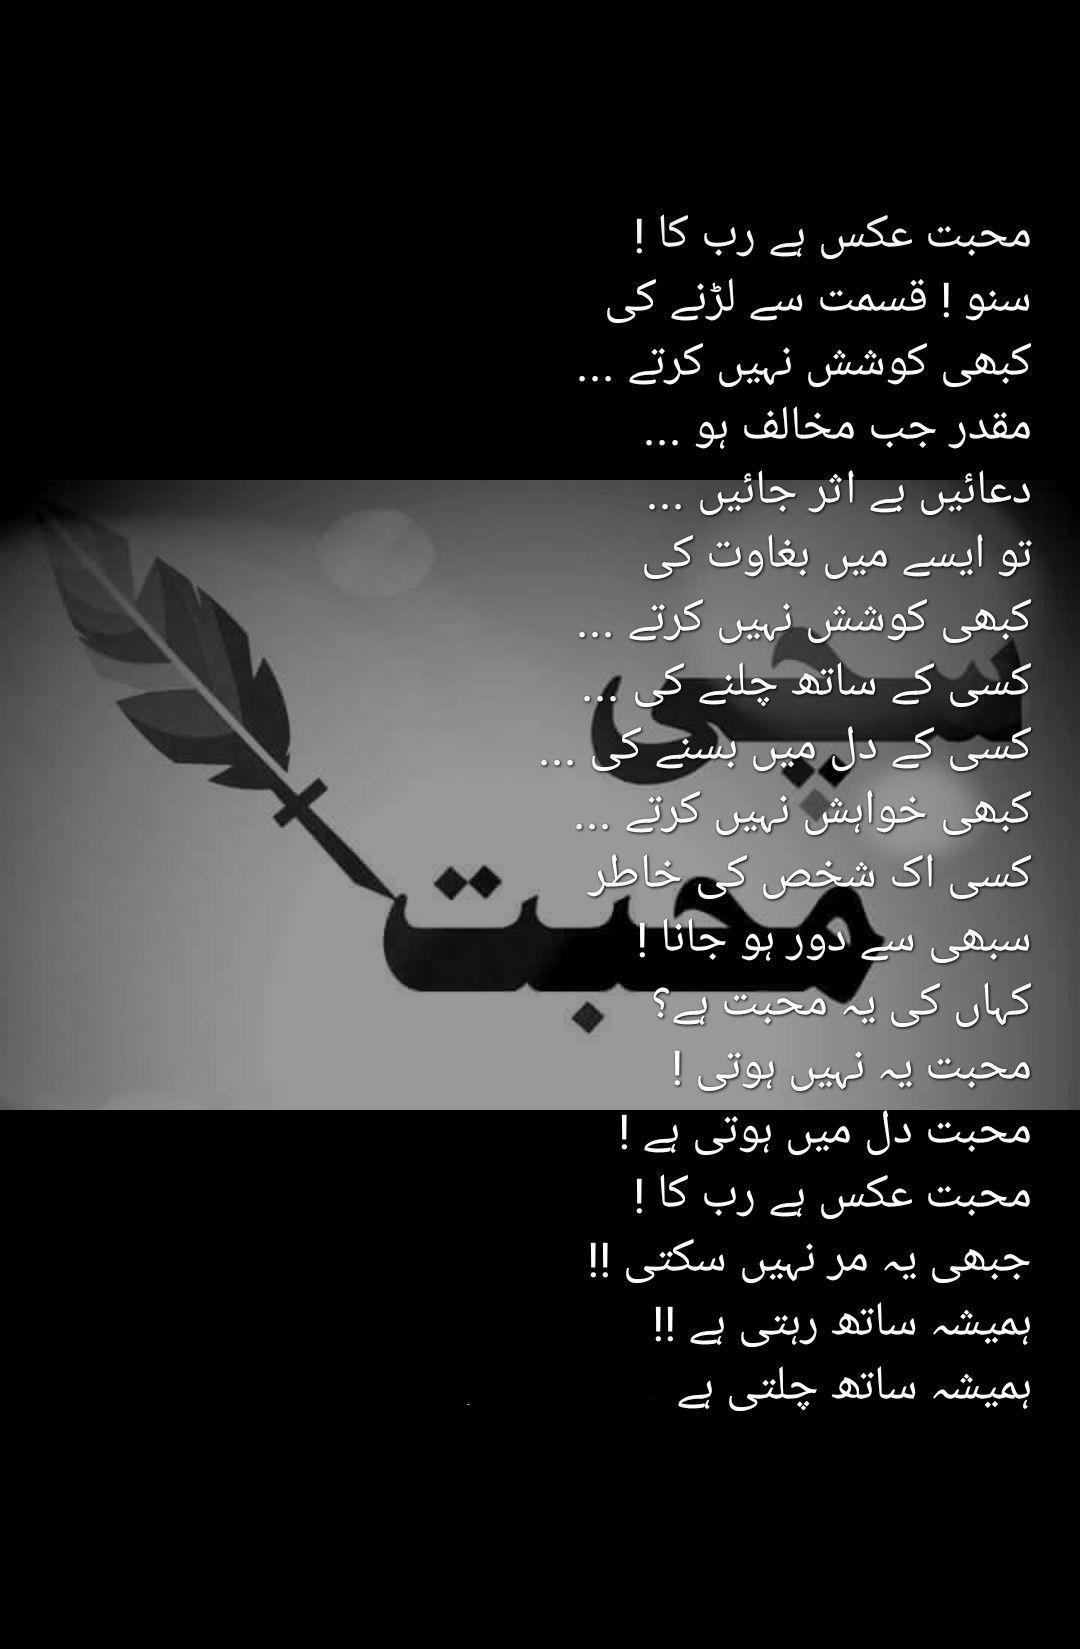 Sachii Mohabbat.. ♥ Poetry collection, Urdu poetry, Poetry